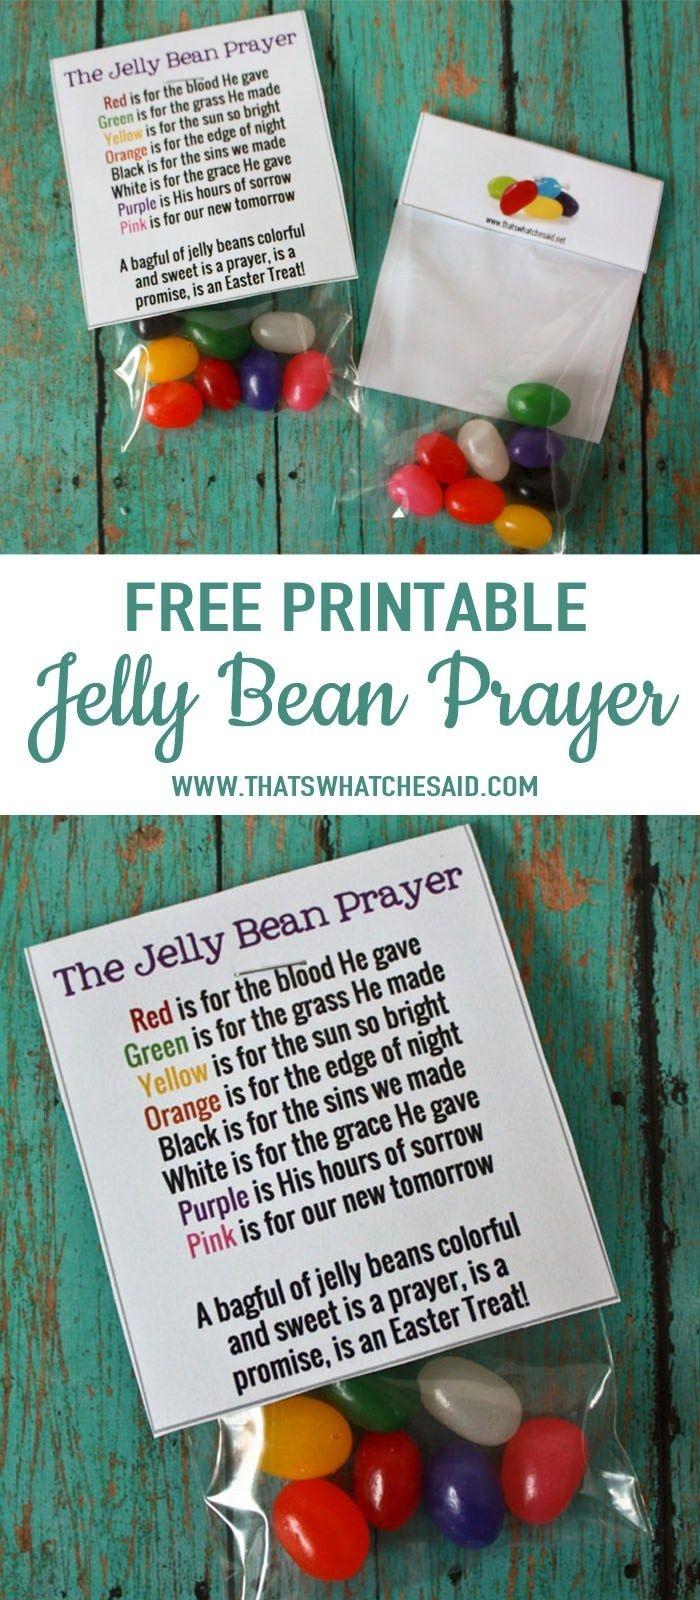 Jelly Bean Prayer Free Printable | As Seen On Thatswhatchesaid - Free Printable Easter Sermons